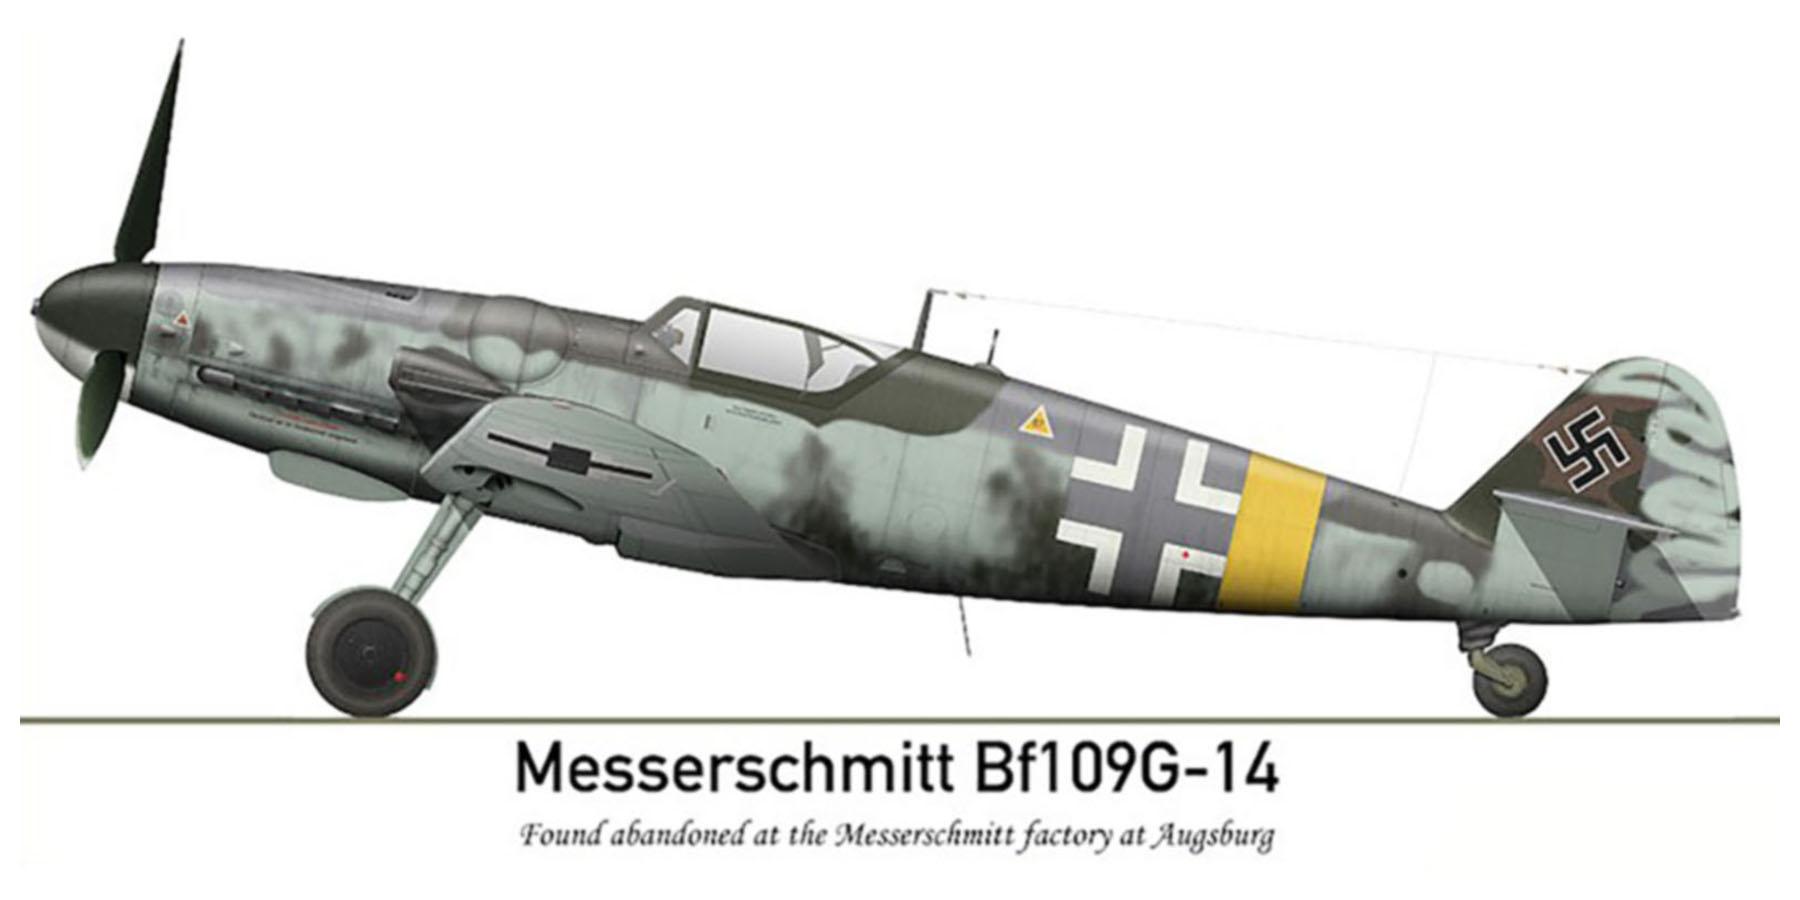 Messerschmitt Bf 109G14 Erla RVT WNr 165545 unknown unit lies abandoned Augsburg Bavaria Germany May 1945 0A